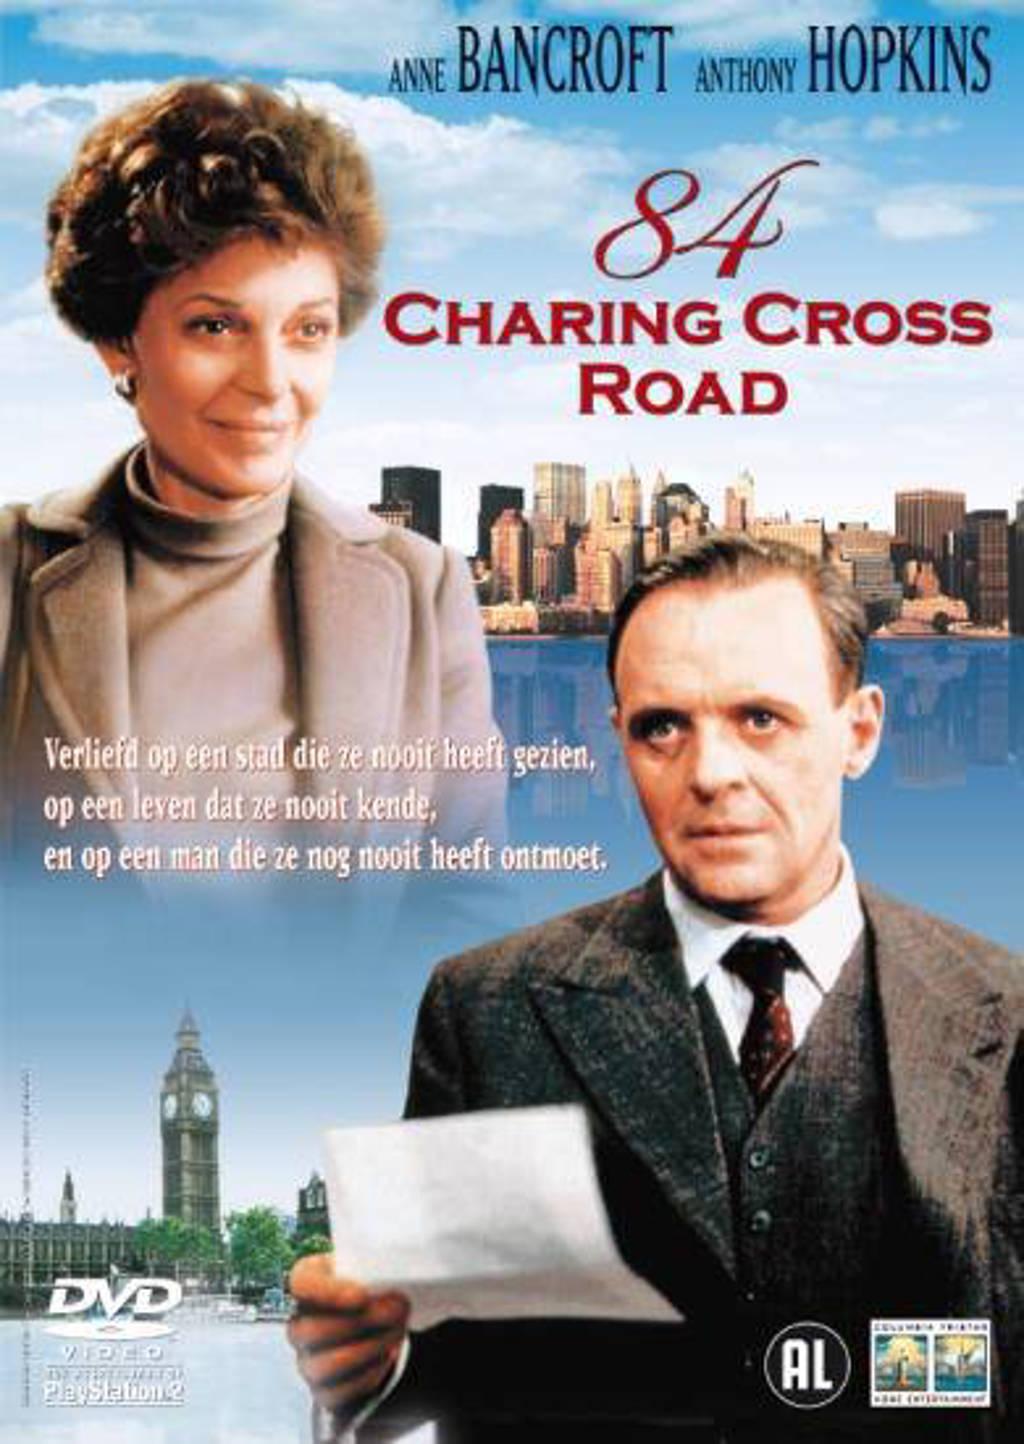 84 Charing cross road (DVD)